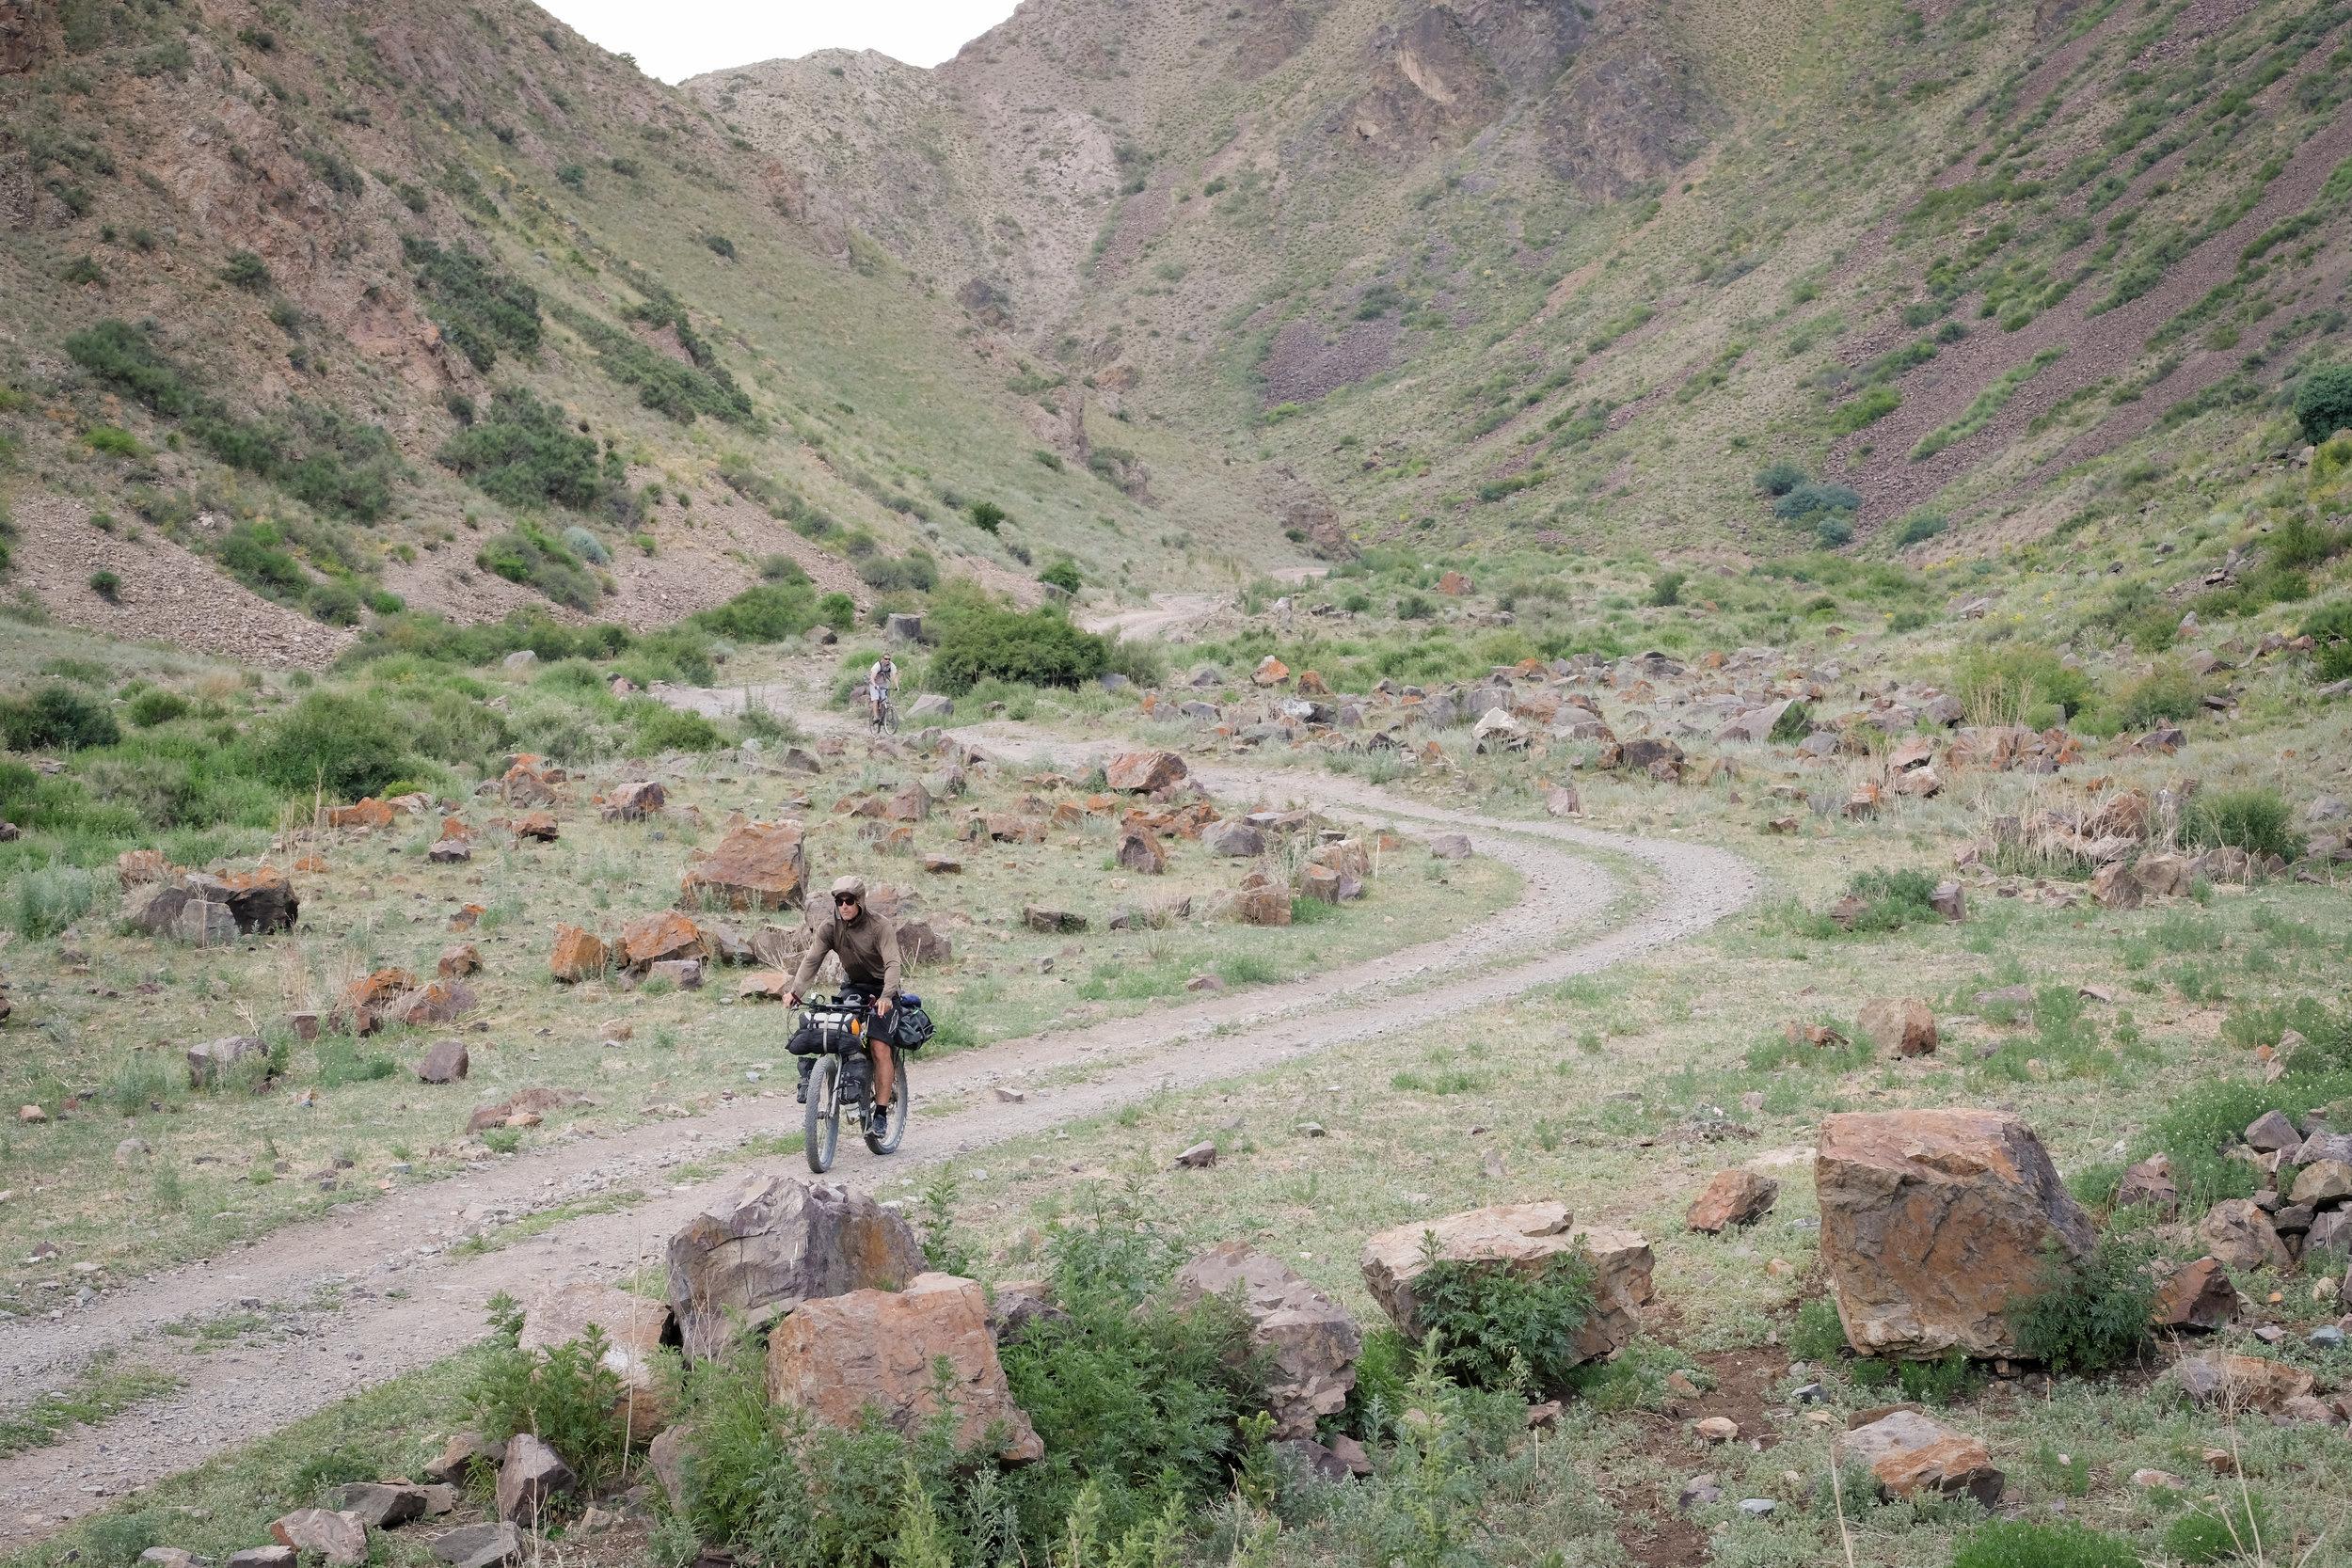 kazakh-corner-route-5093_35091335040_o.jpg